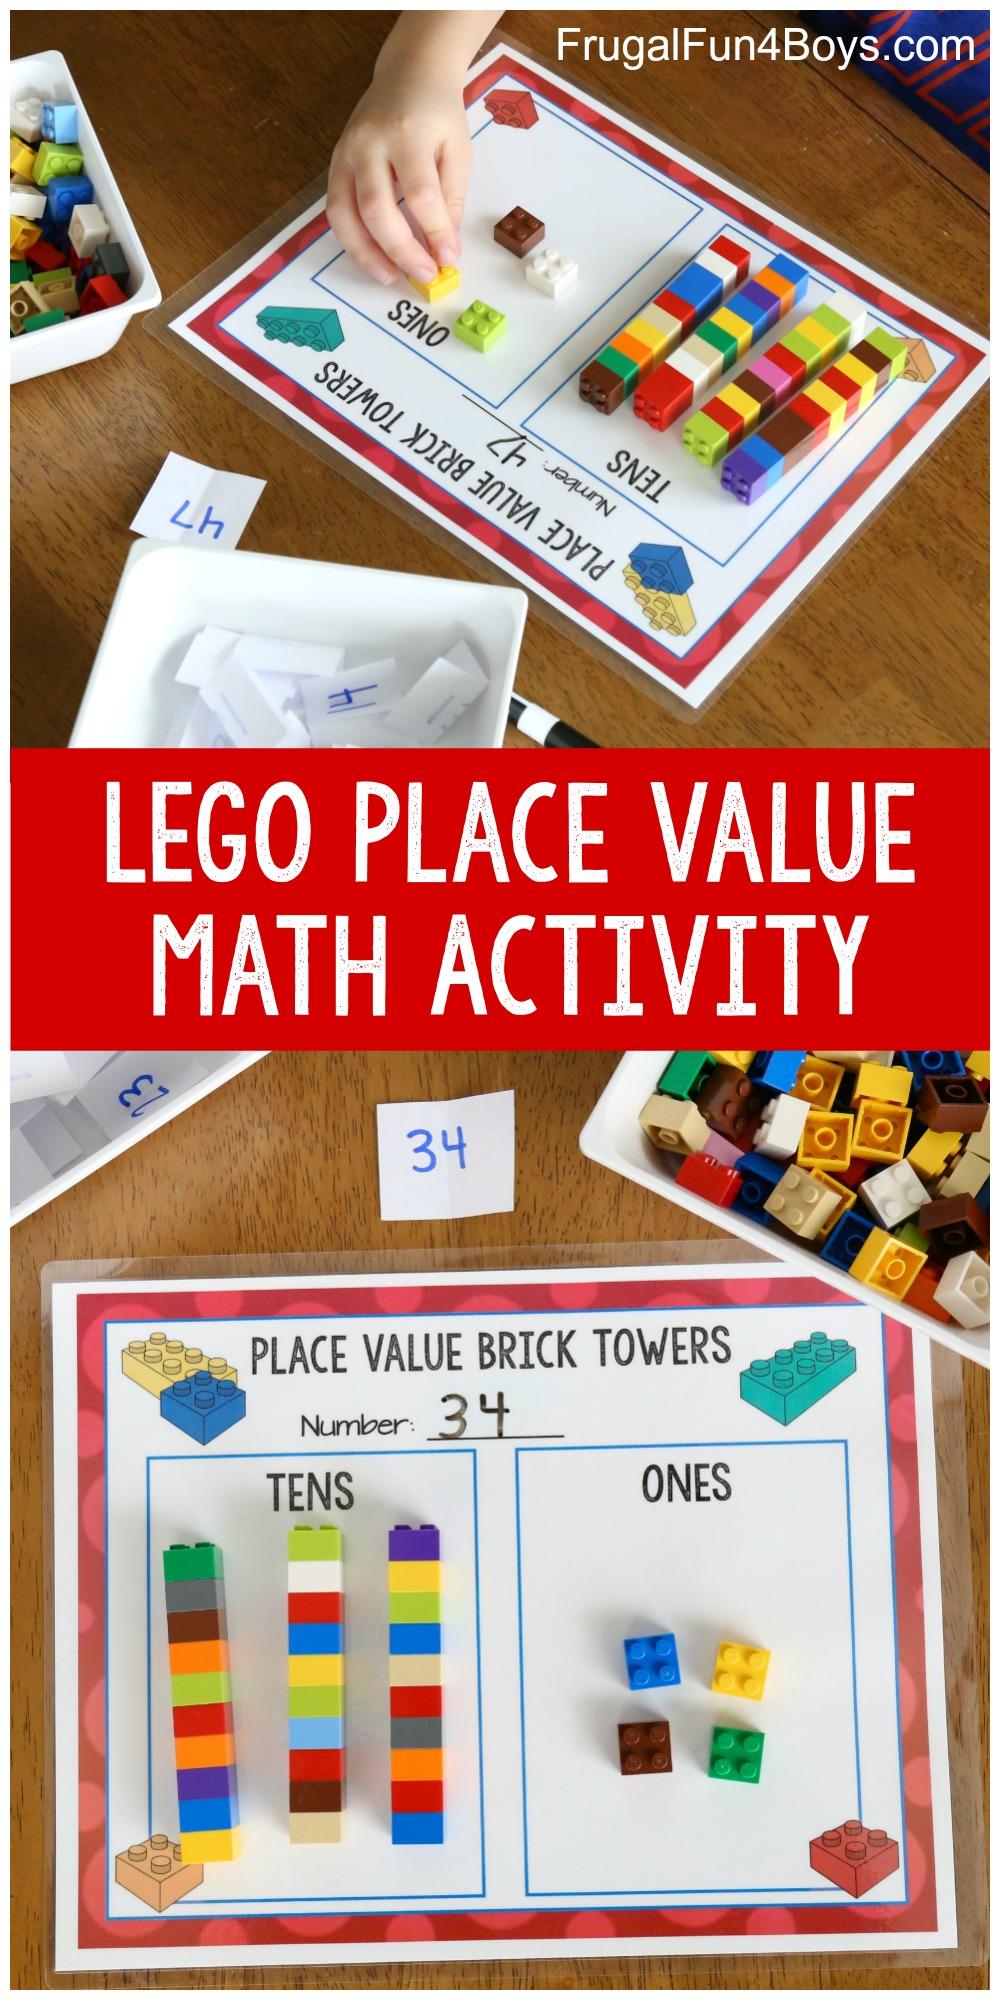 Place value homework ideas cover letter sample job application